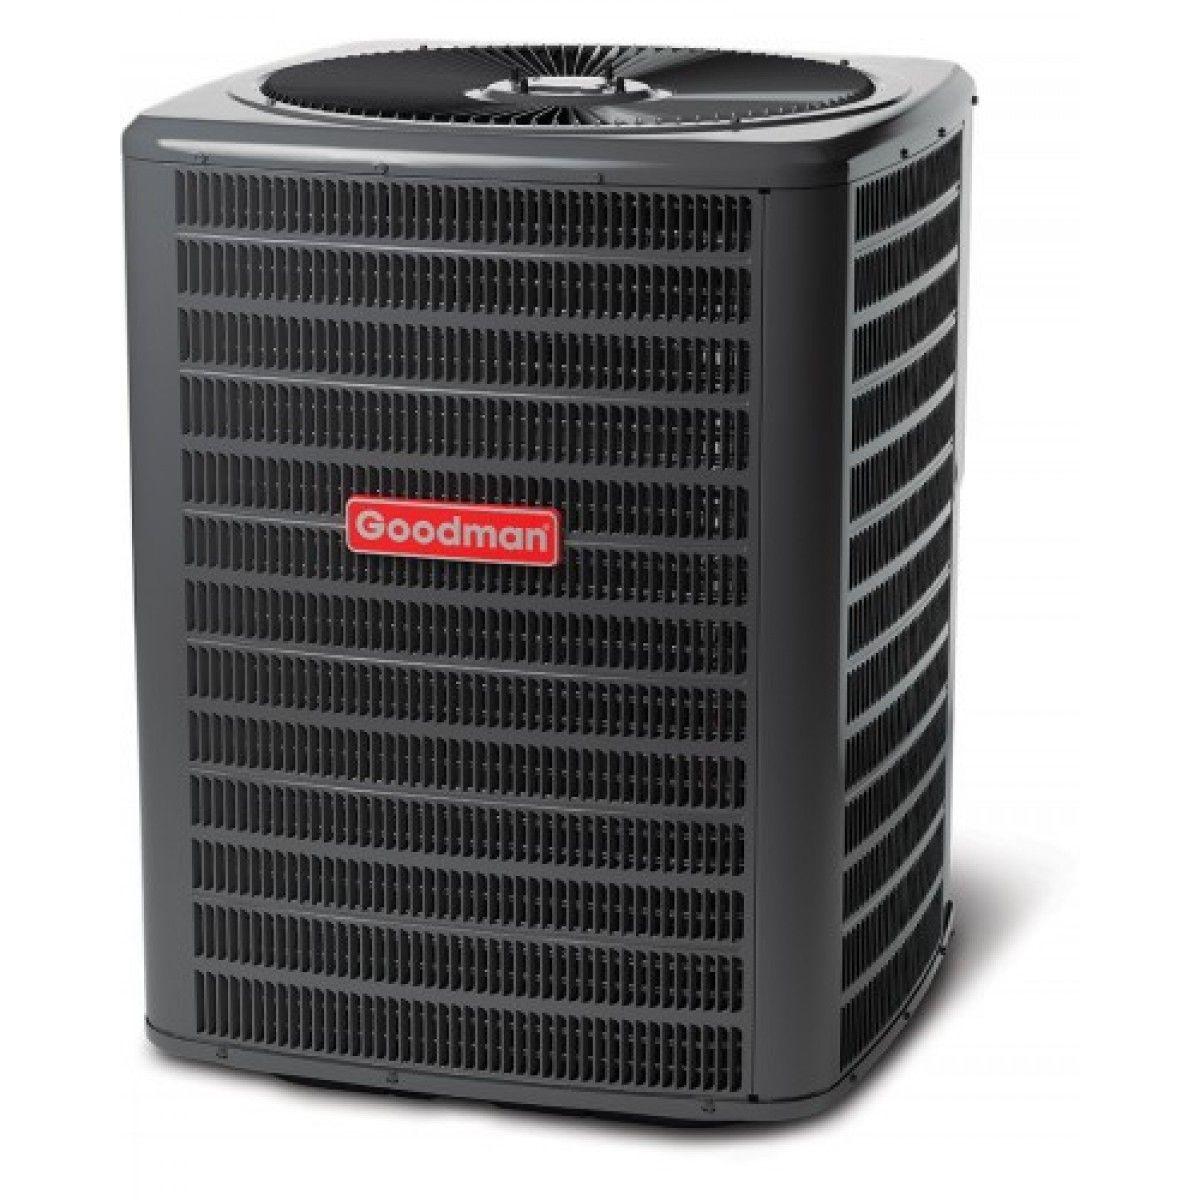 1.5 Ton Ac Unit >> Goodman 2.0 Ton 14 SEER Heat Pump System **One Time Special** - 1.5 Ton - 2.0 Ton - AC/Heat Pump ...